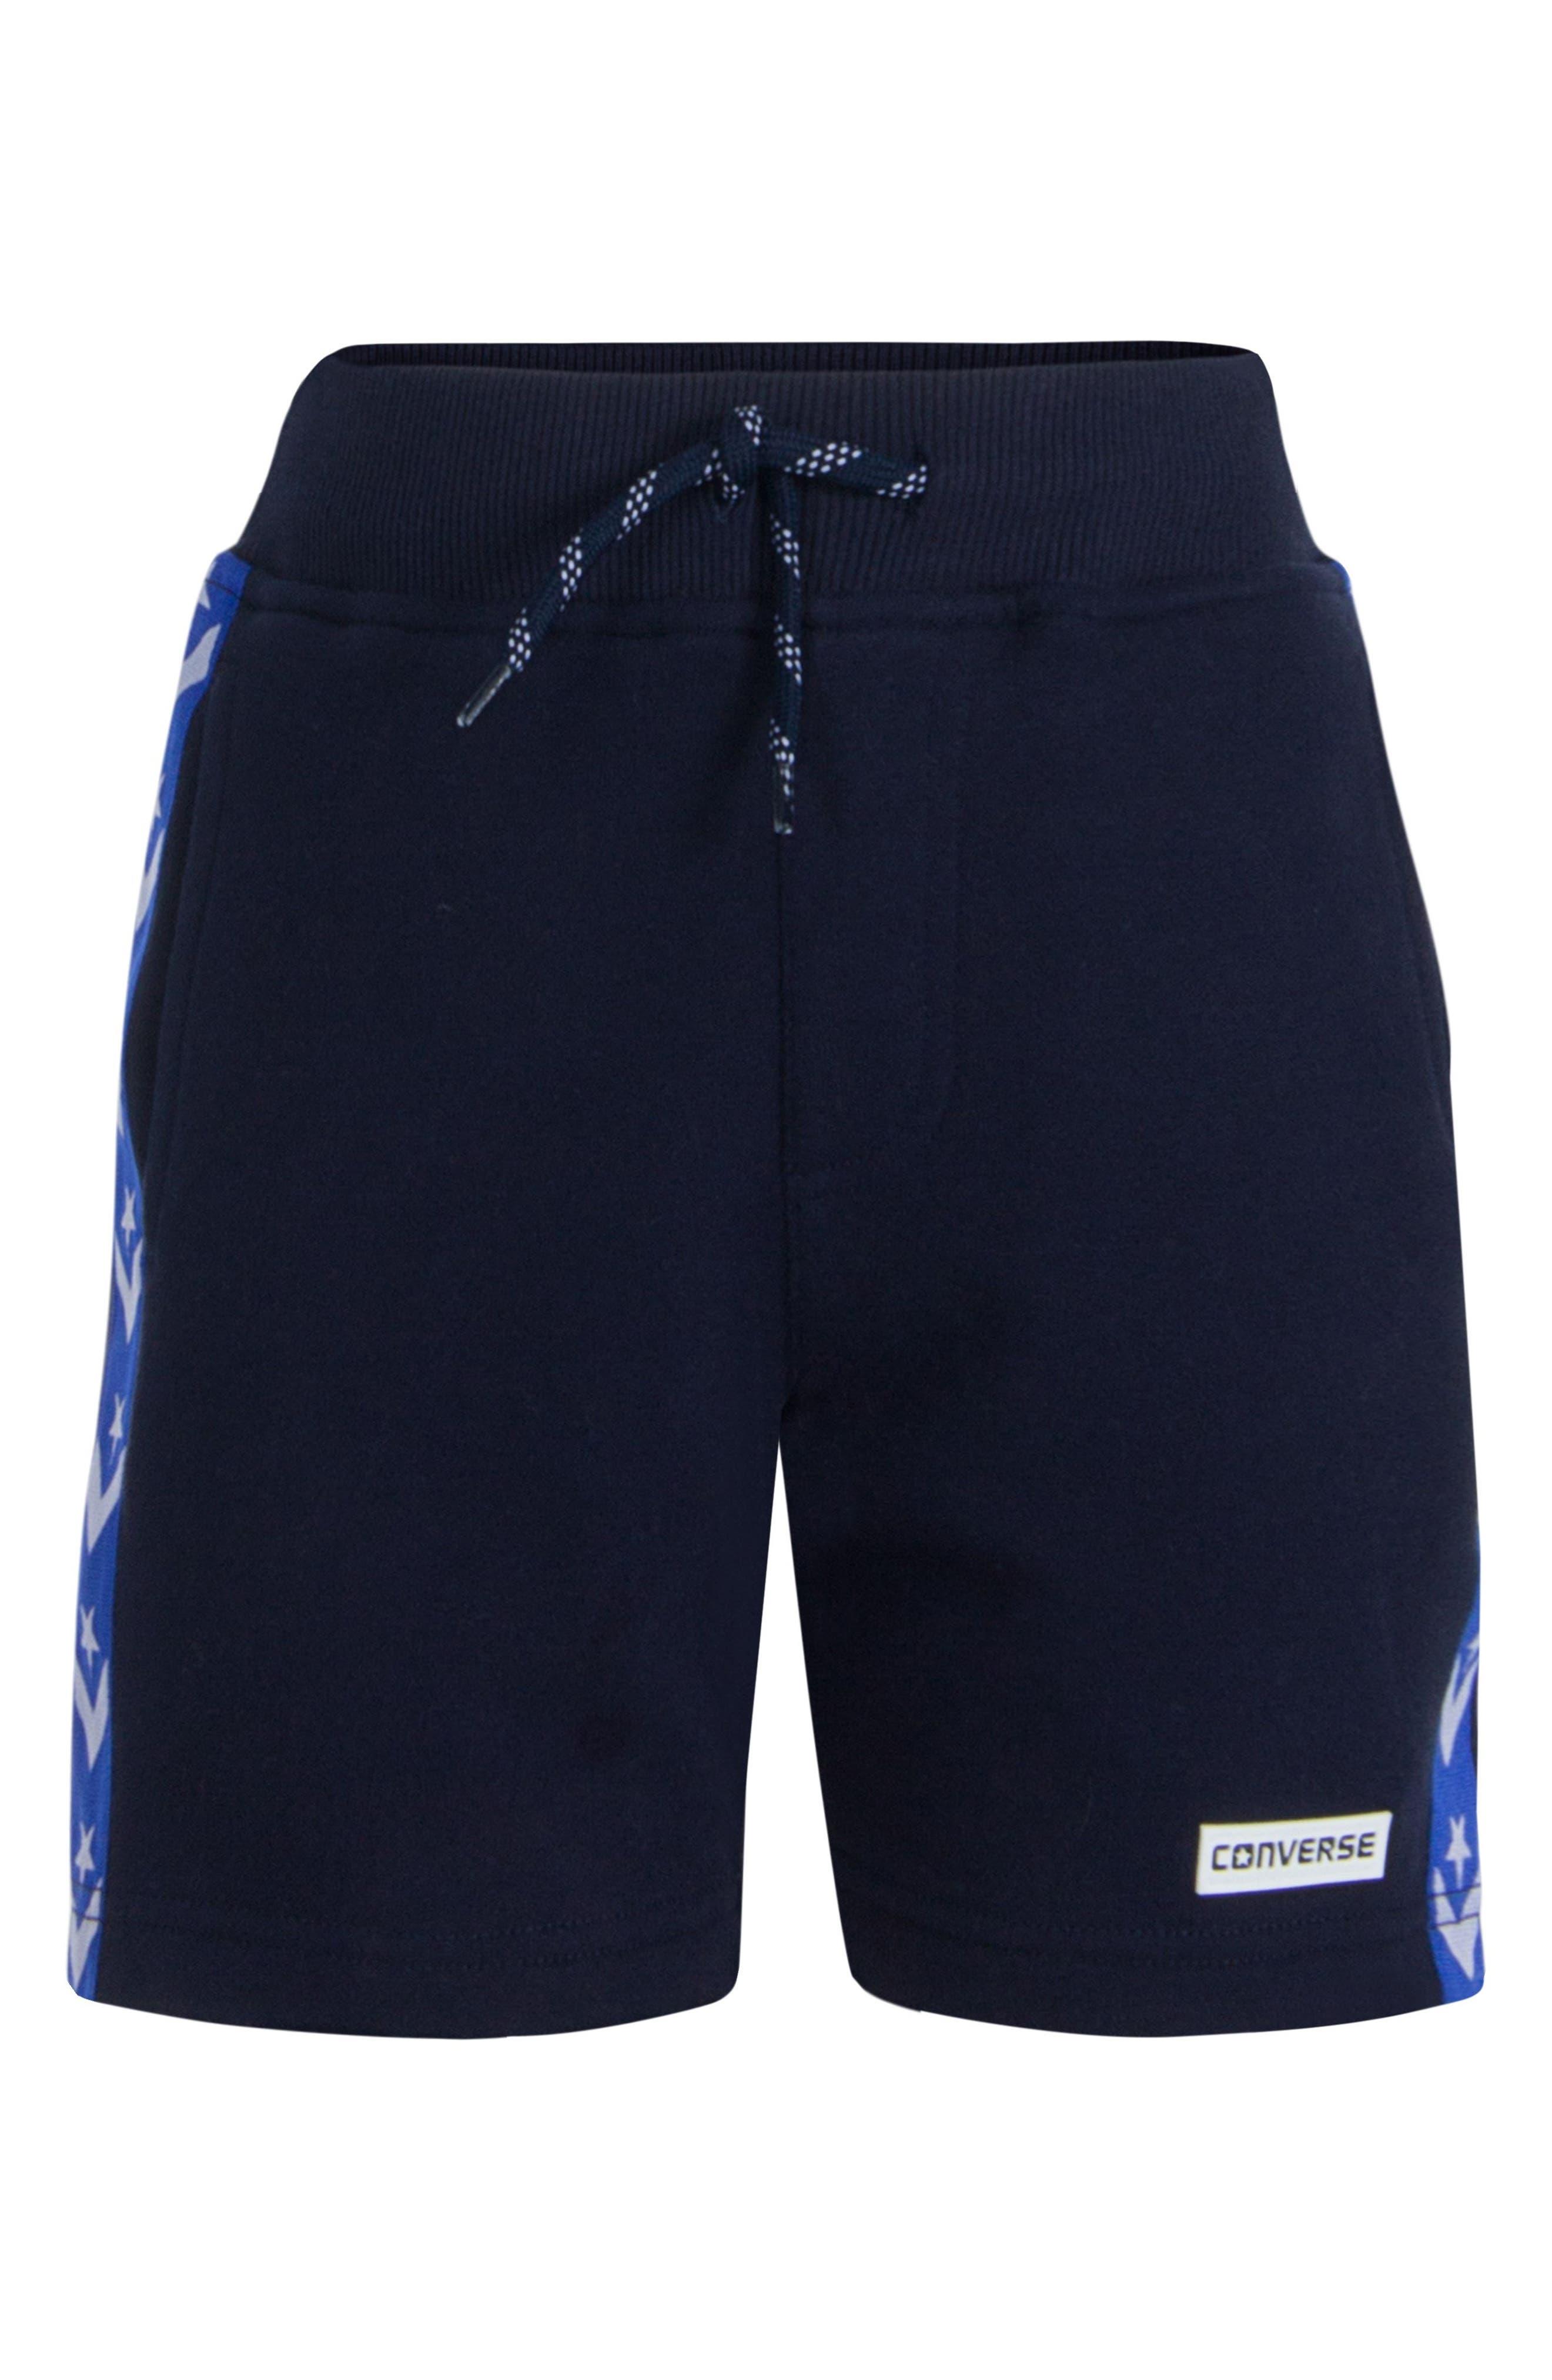 Alternate Image 1 Selected - Converse Star Knit Shorts (Big Boys)